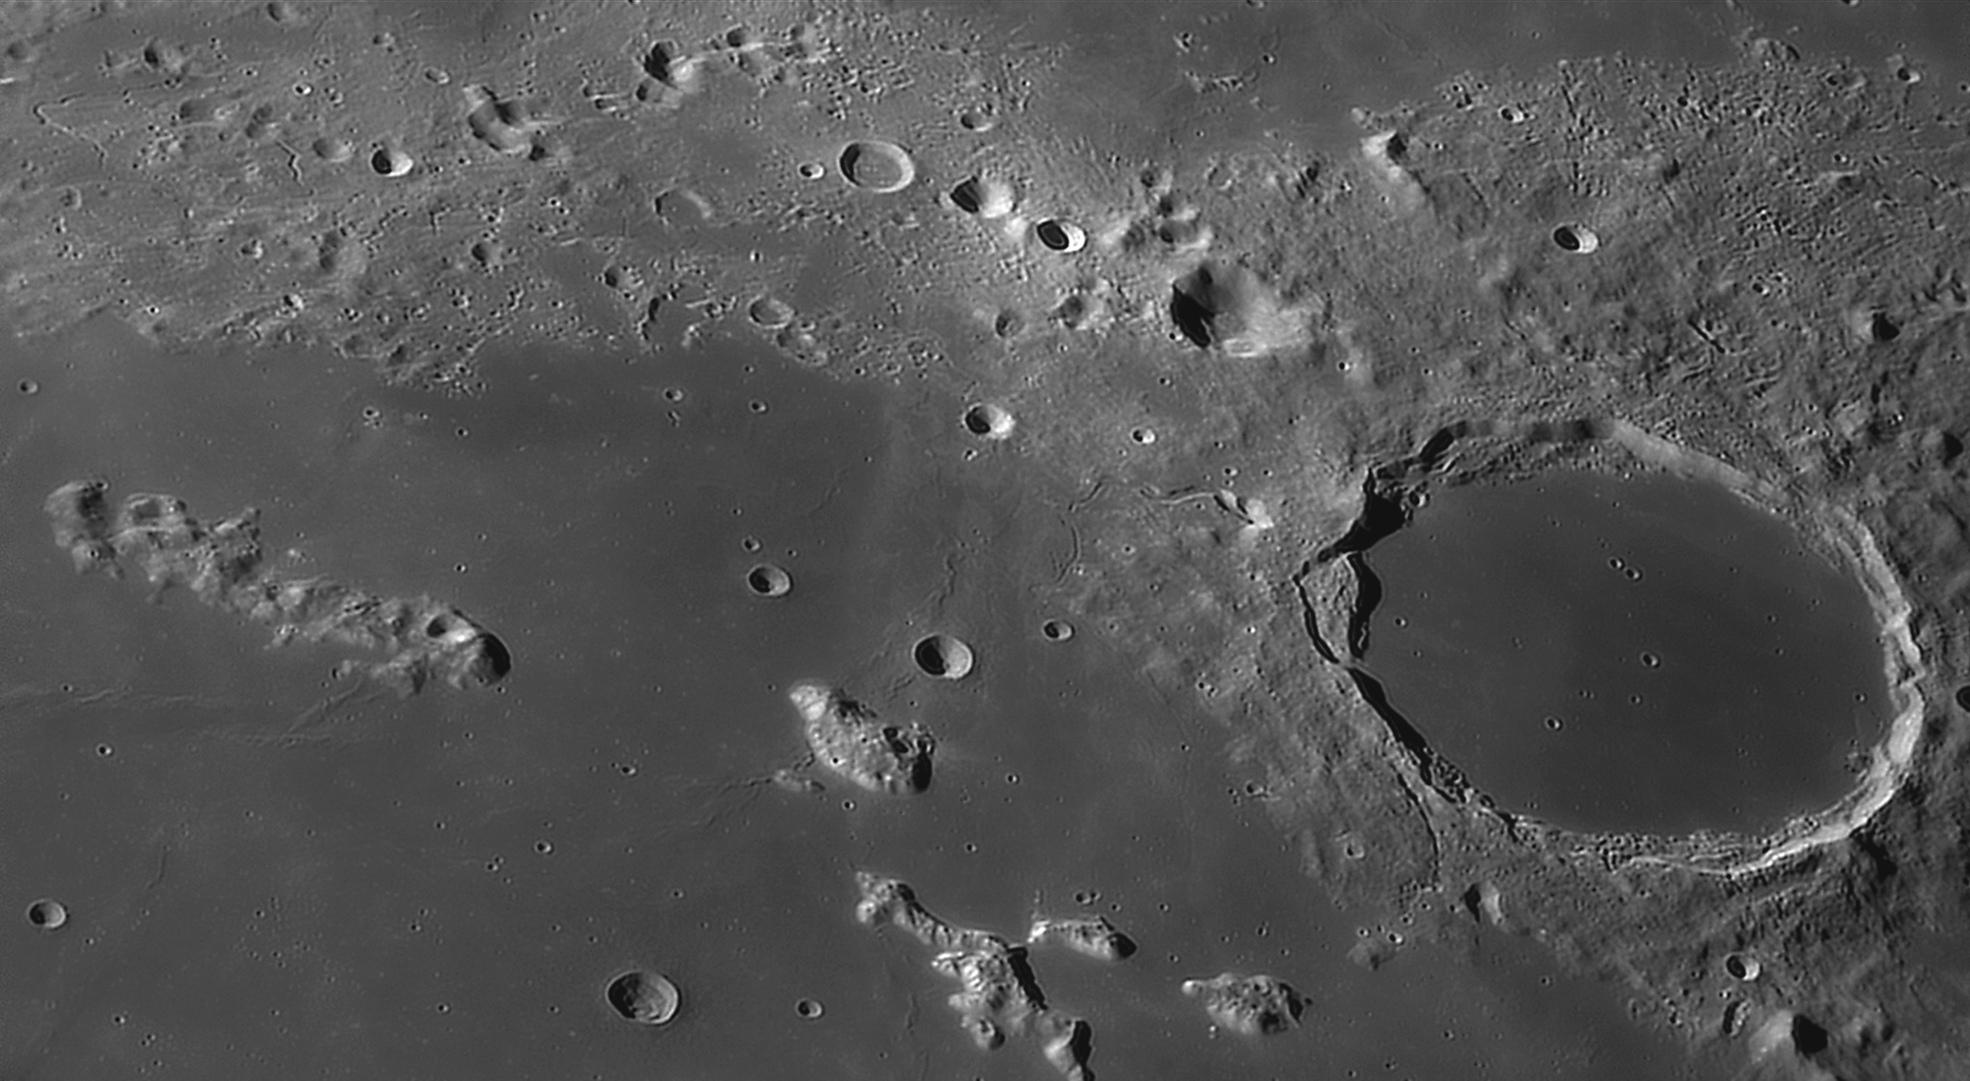 large.moon_20_09_2019_03_56_PLATO.jpg.76b2893f83b0f557531bee1f0b65d0b9.jpg